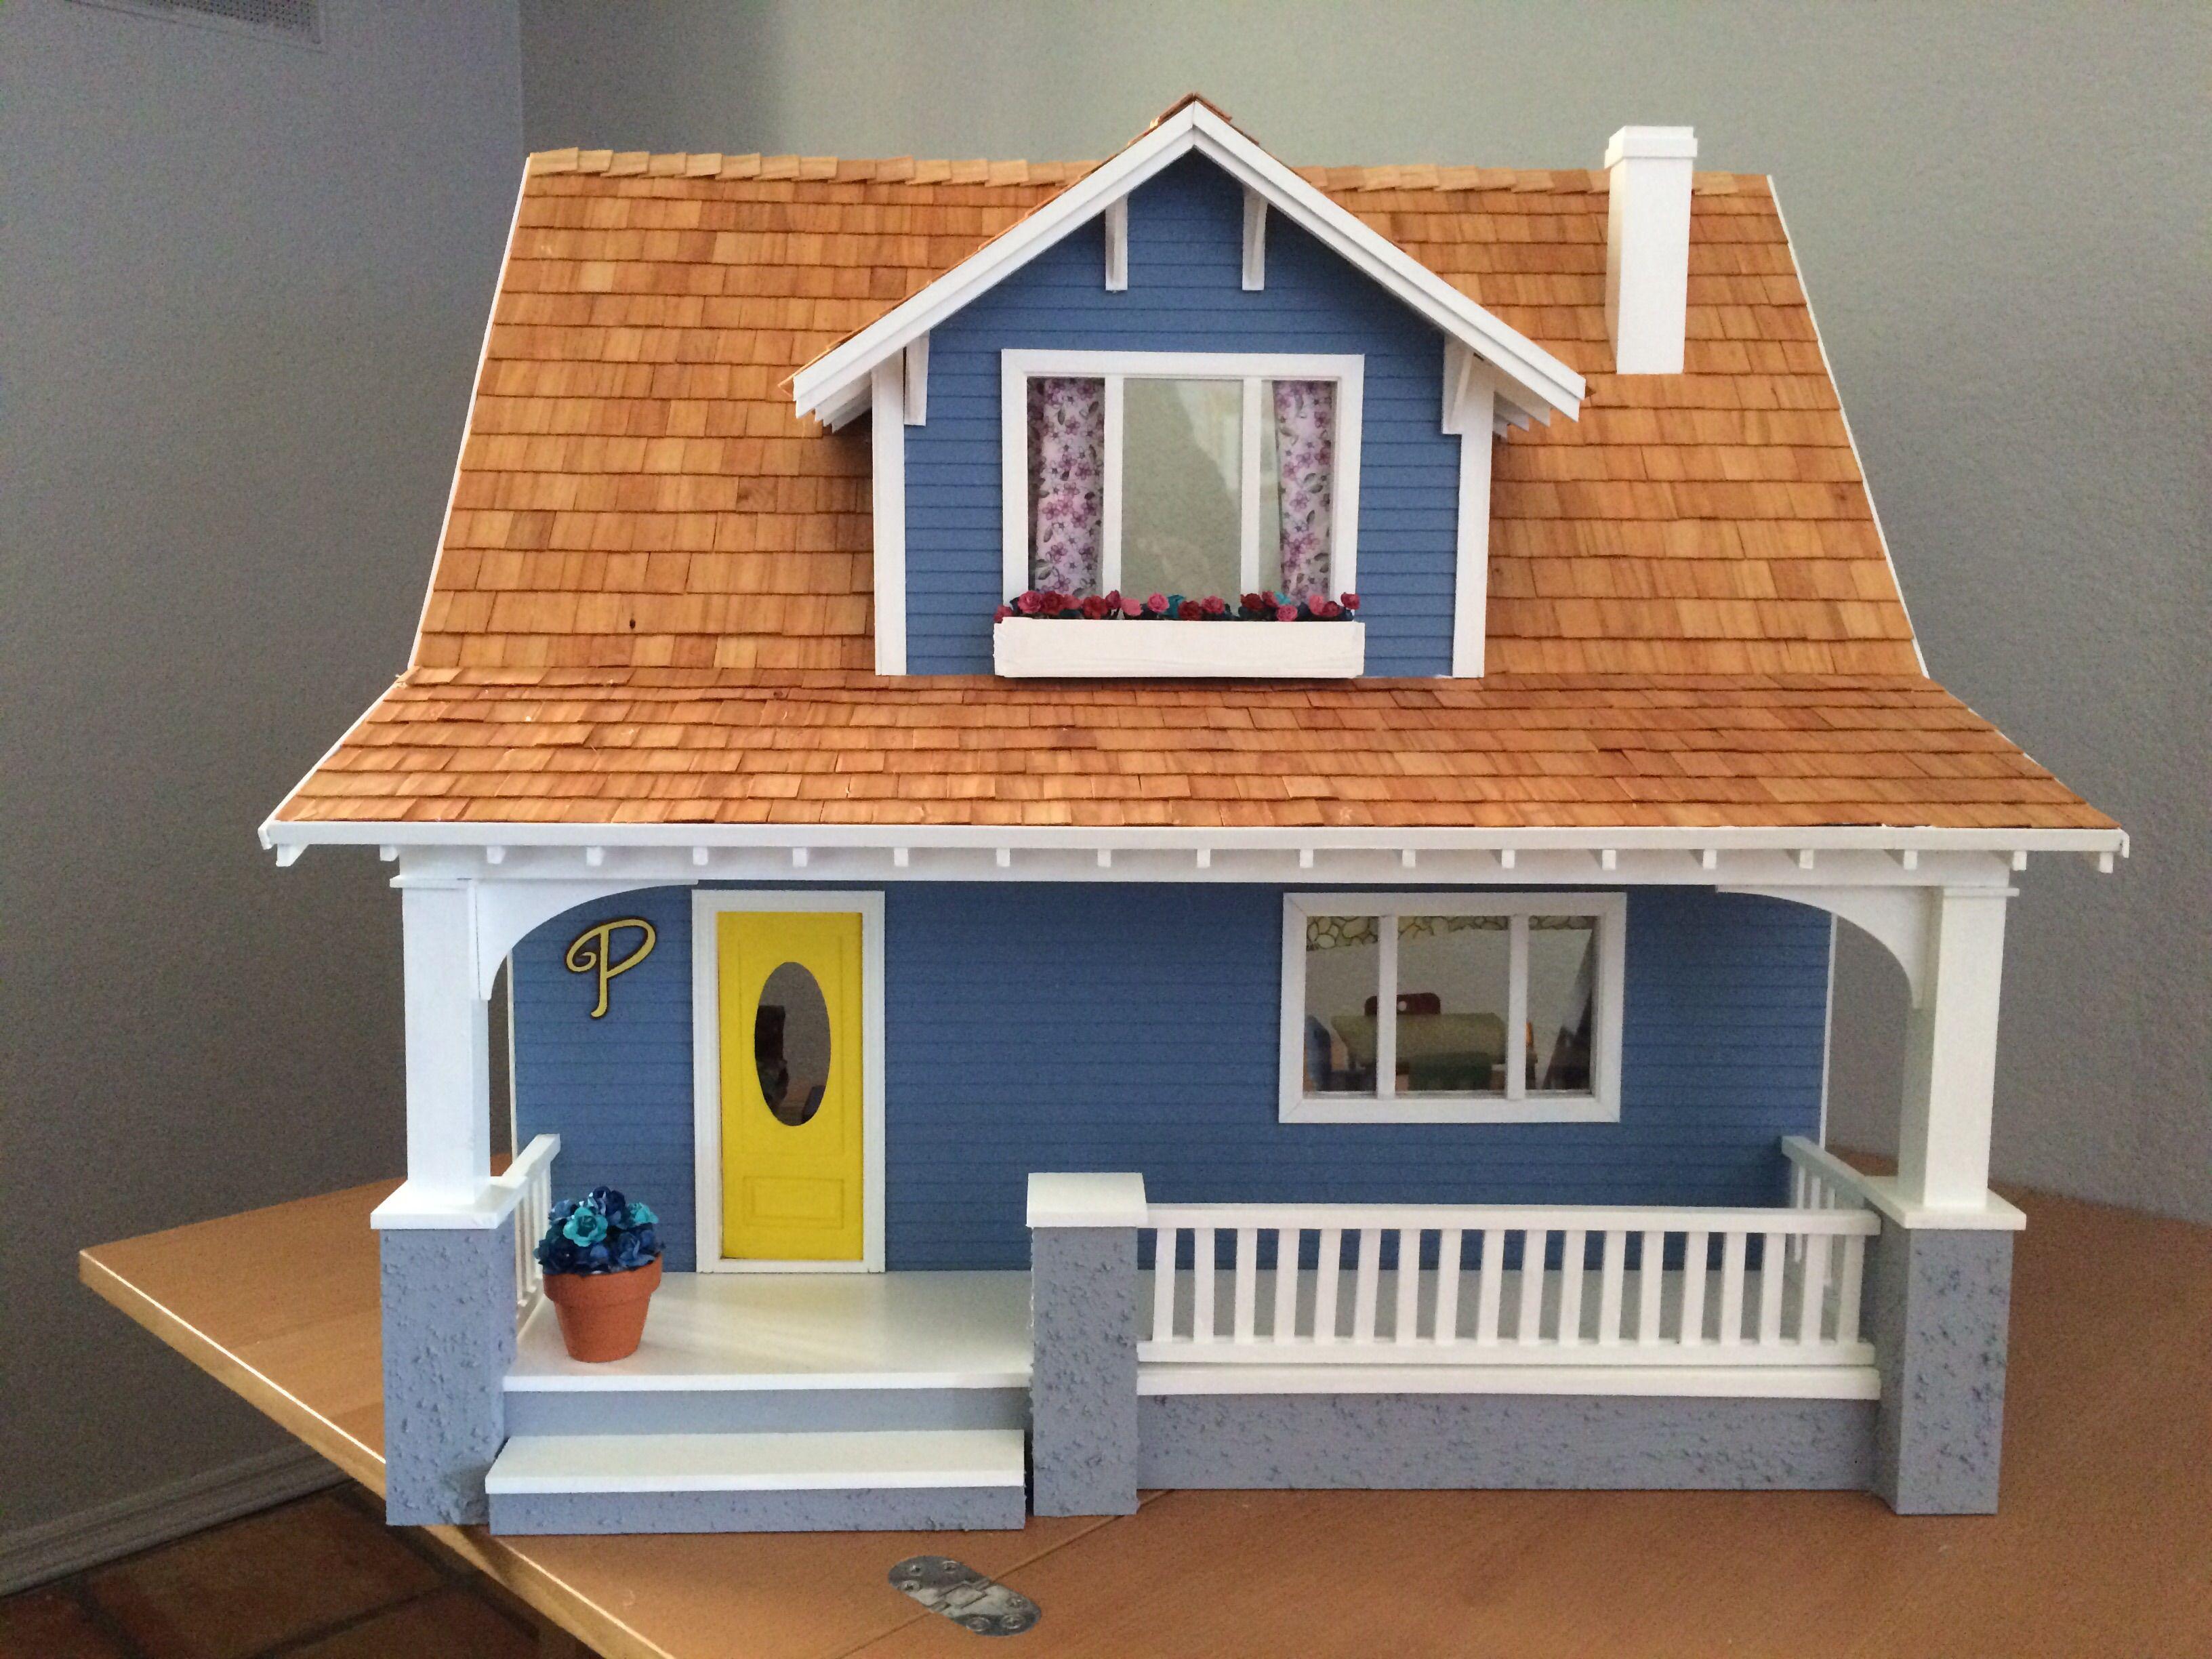 Kit From Hobby Lobby With Images Dollhouse Decor Bird House